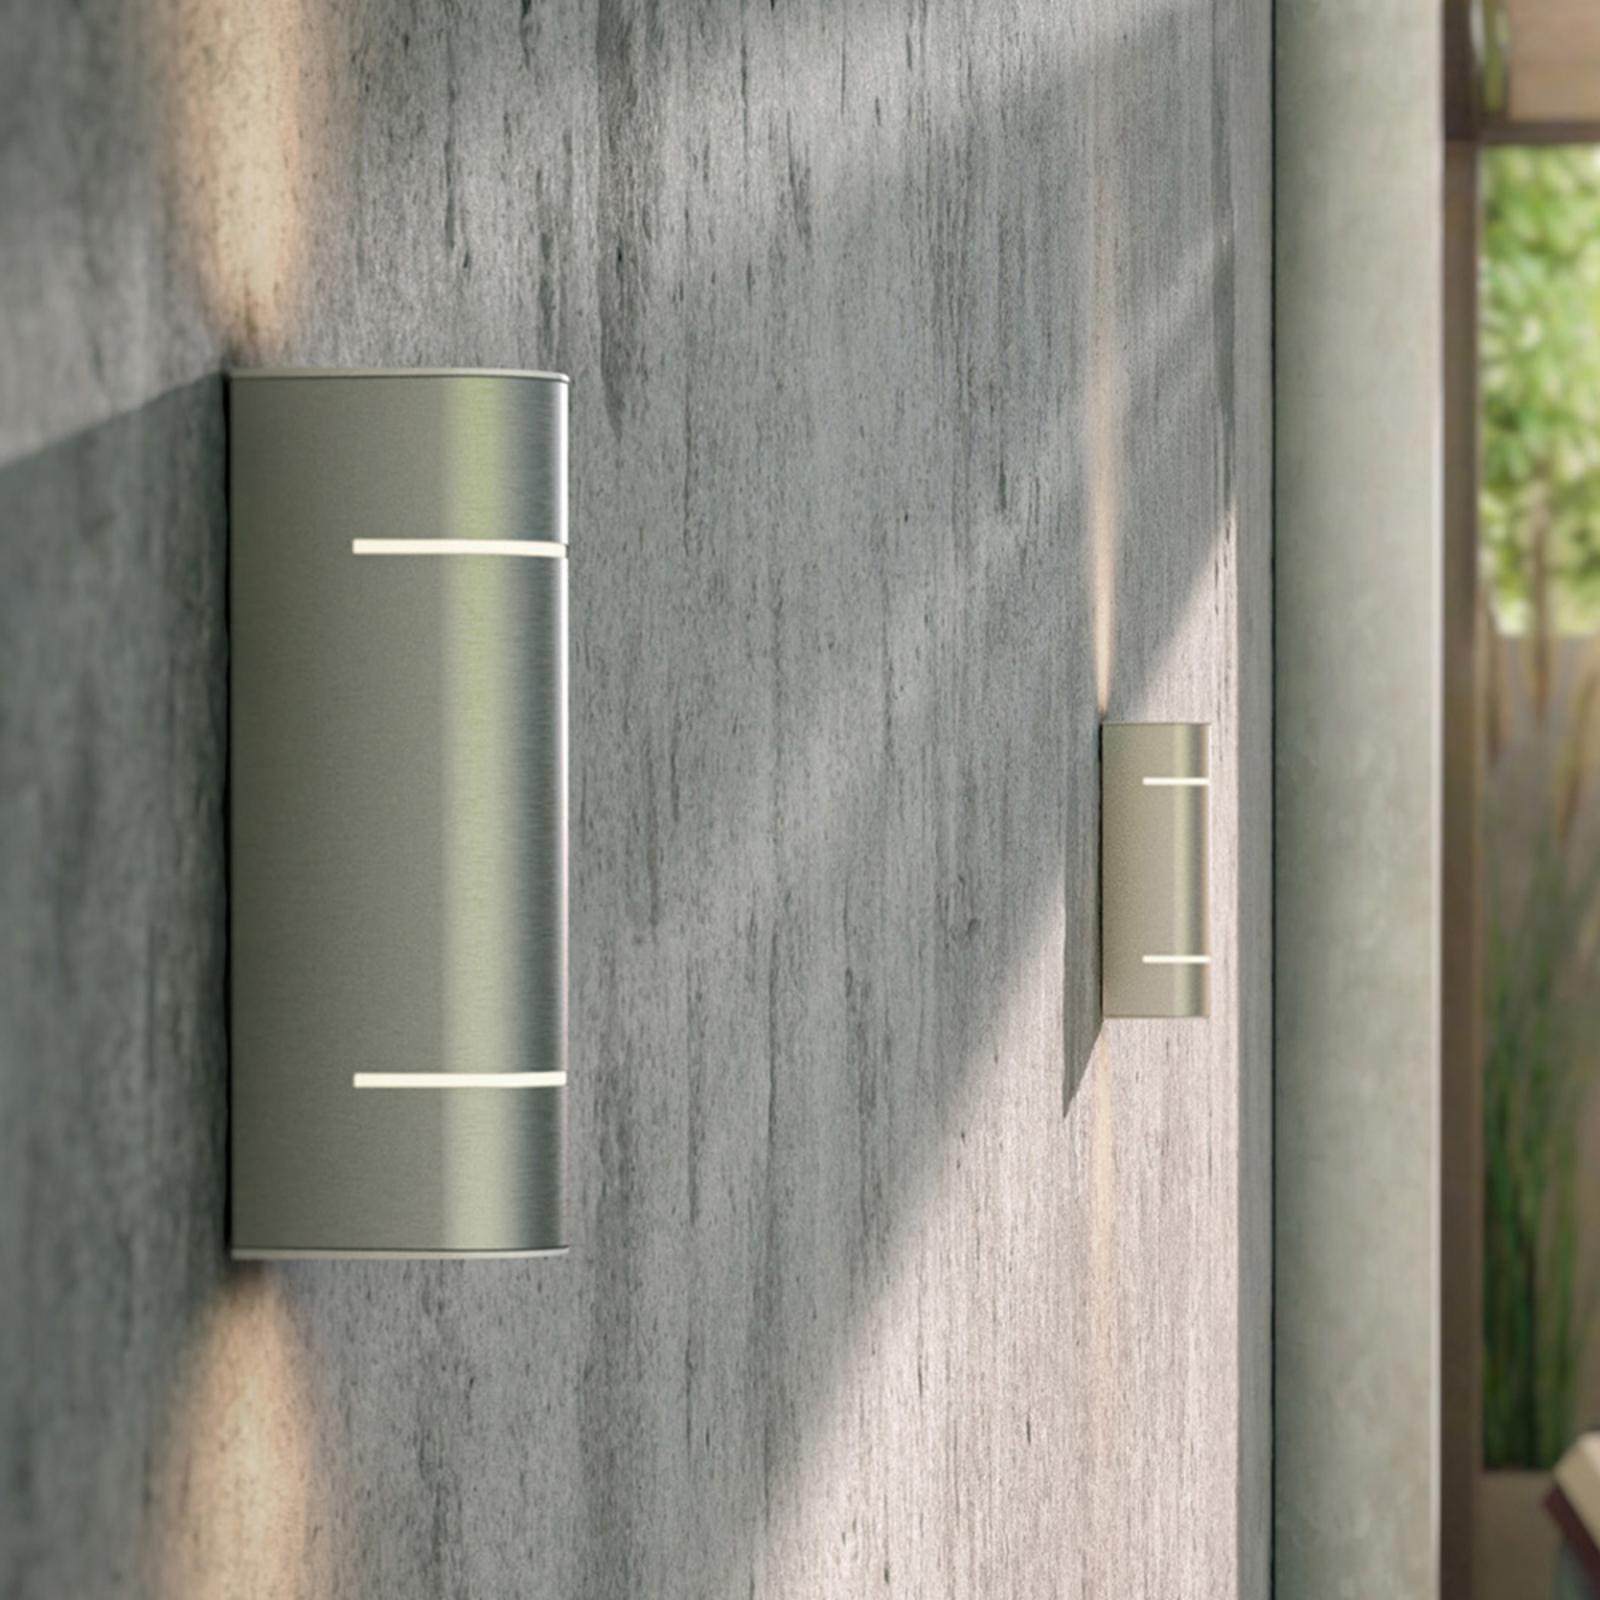 Sunset LED-buitenwandlamp van roestvrij staal